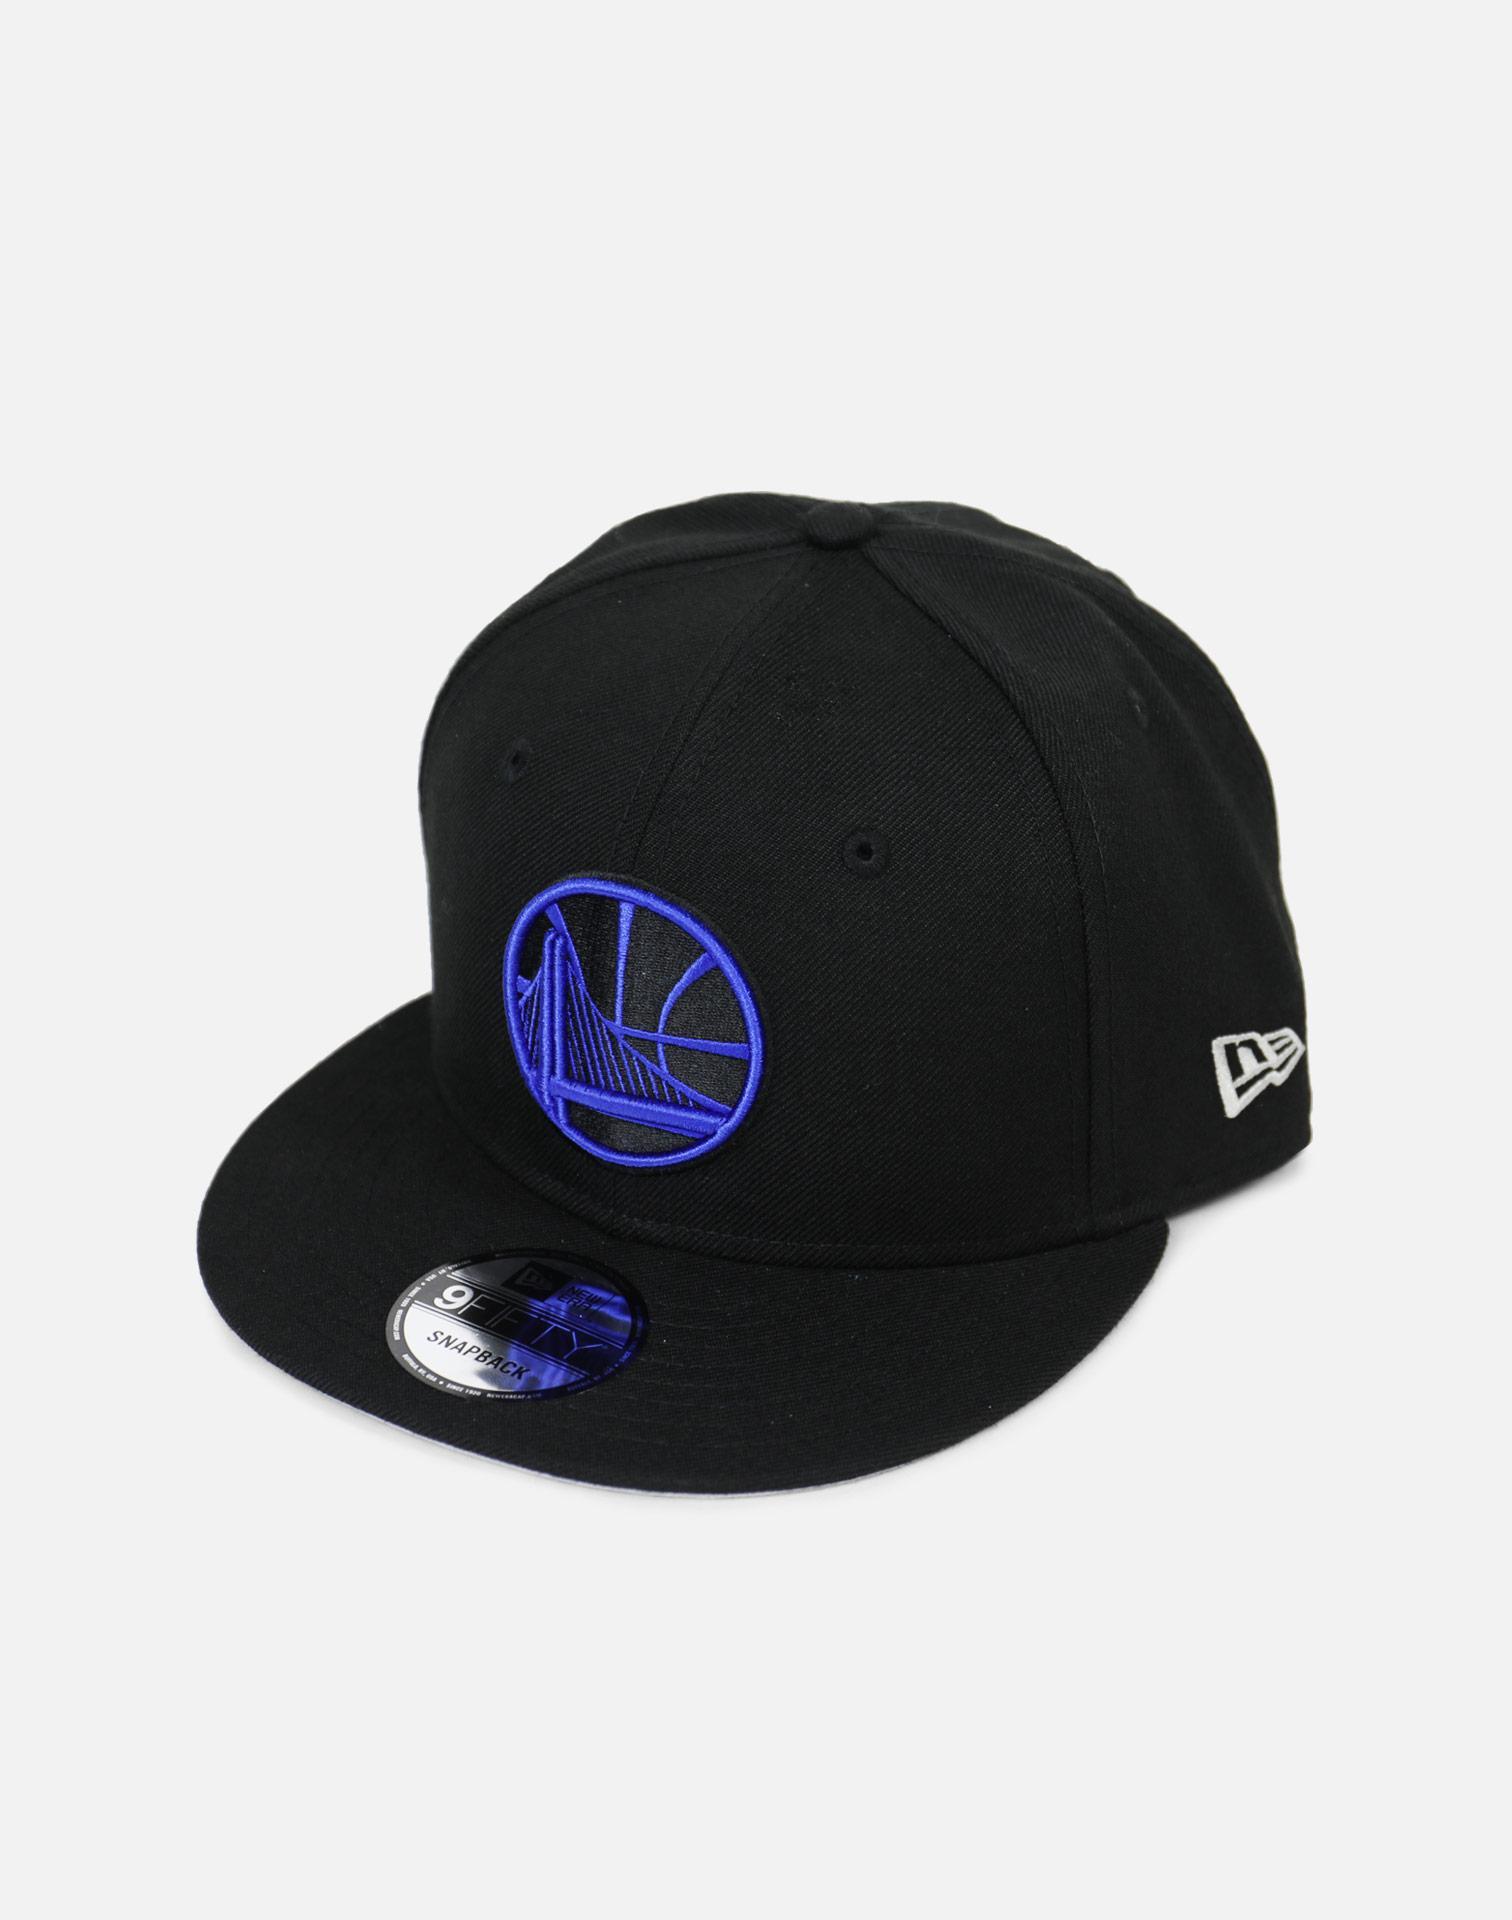 Lyst - Ktz Golden State Warriors Royal Hook Snapback Hat in Black ... 9f29e02a0ab2